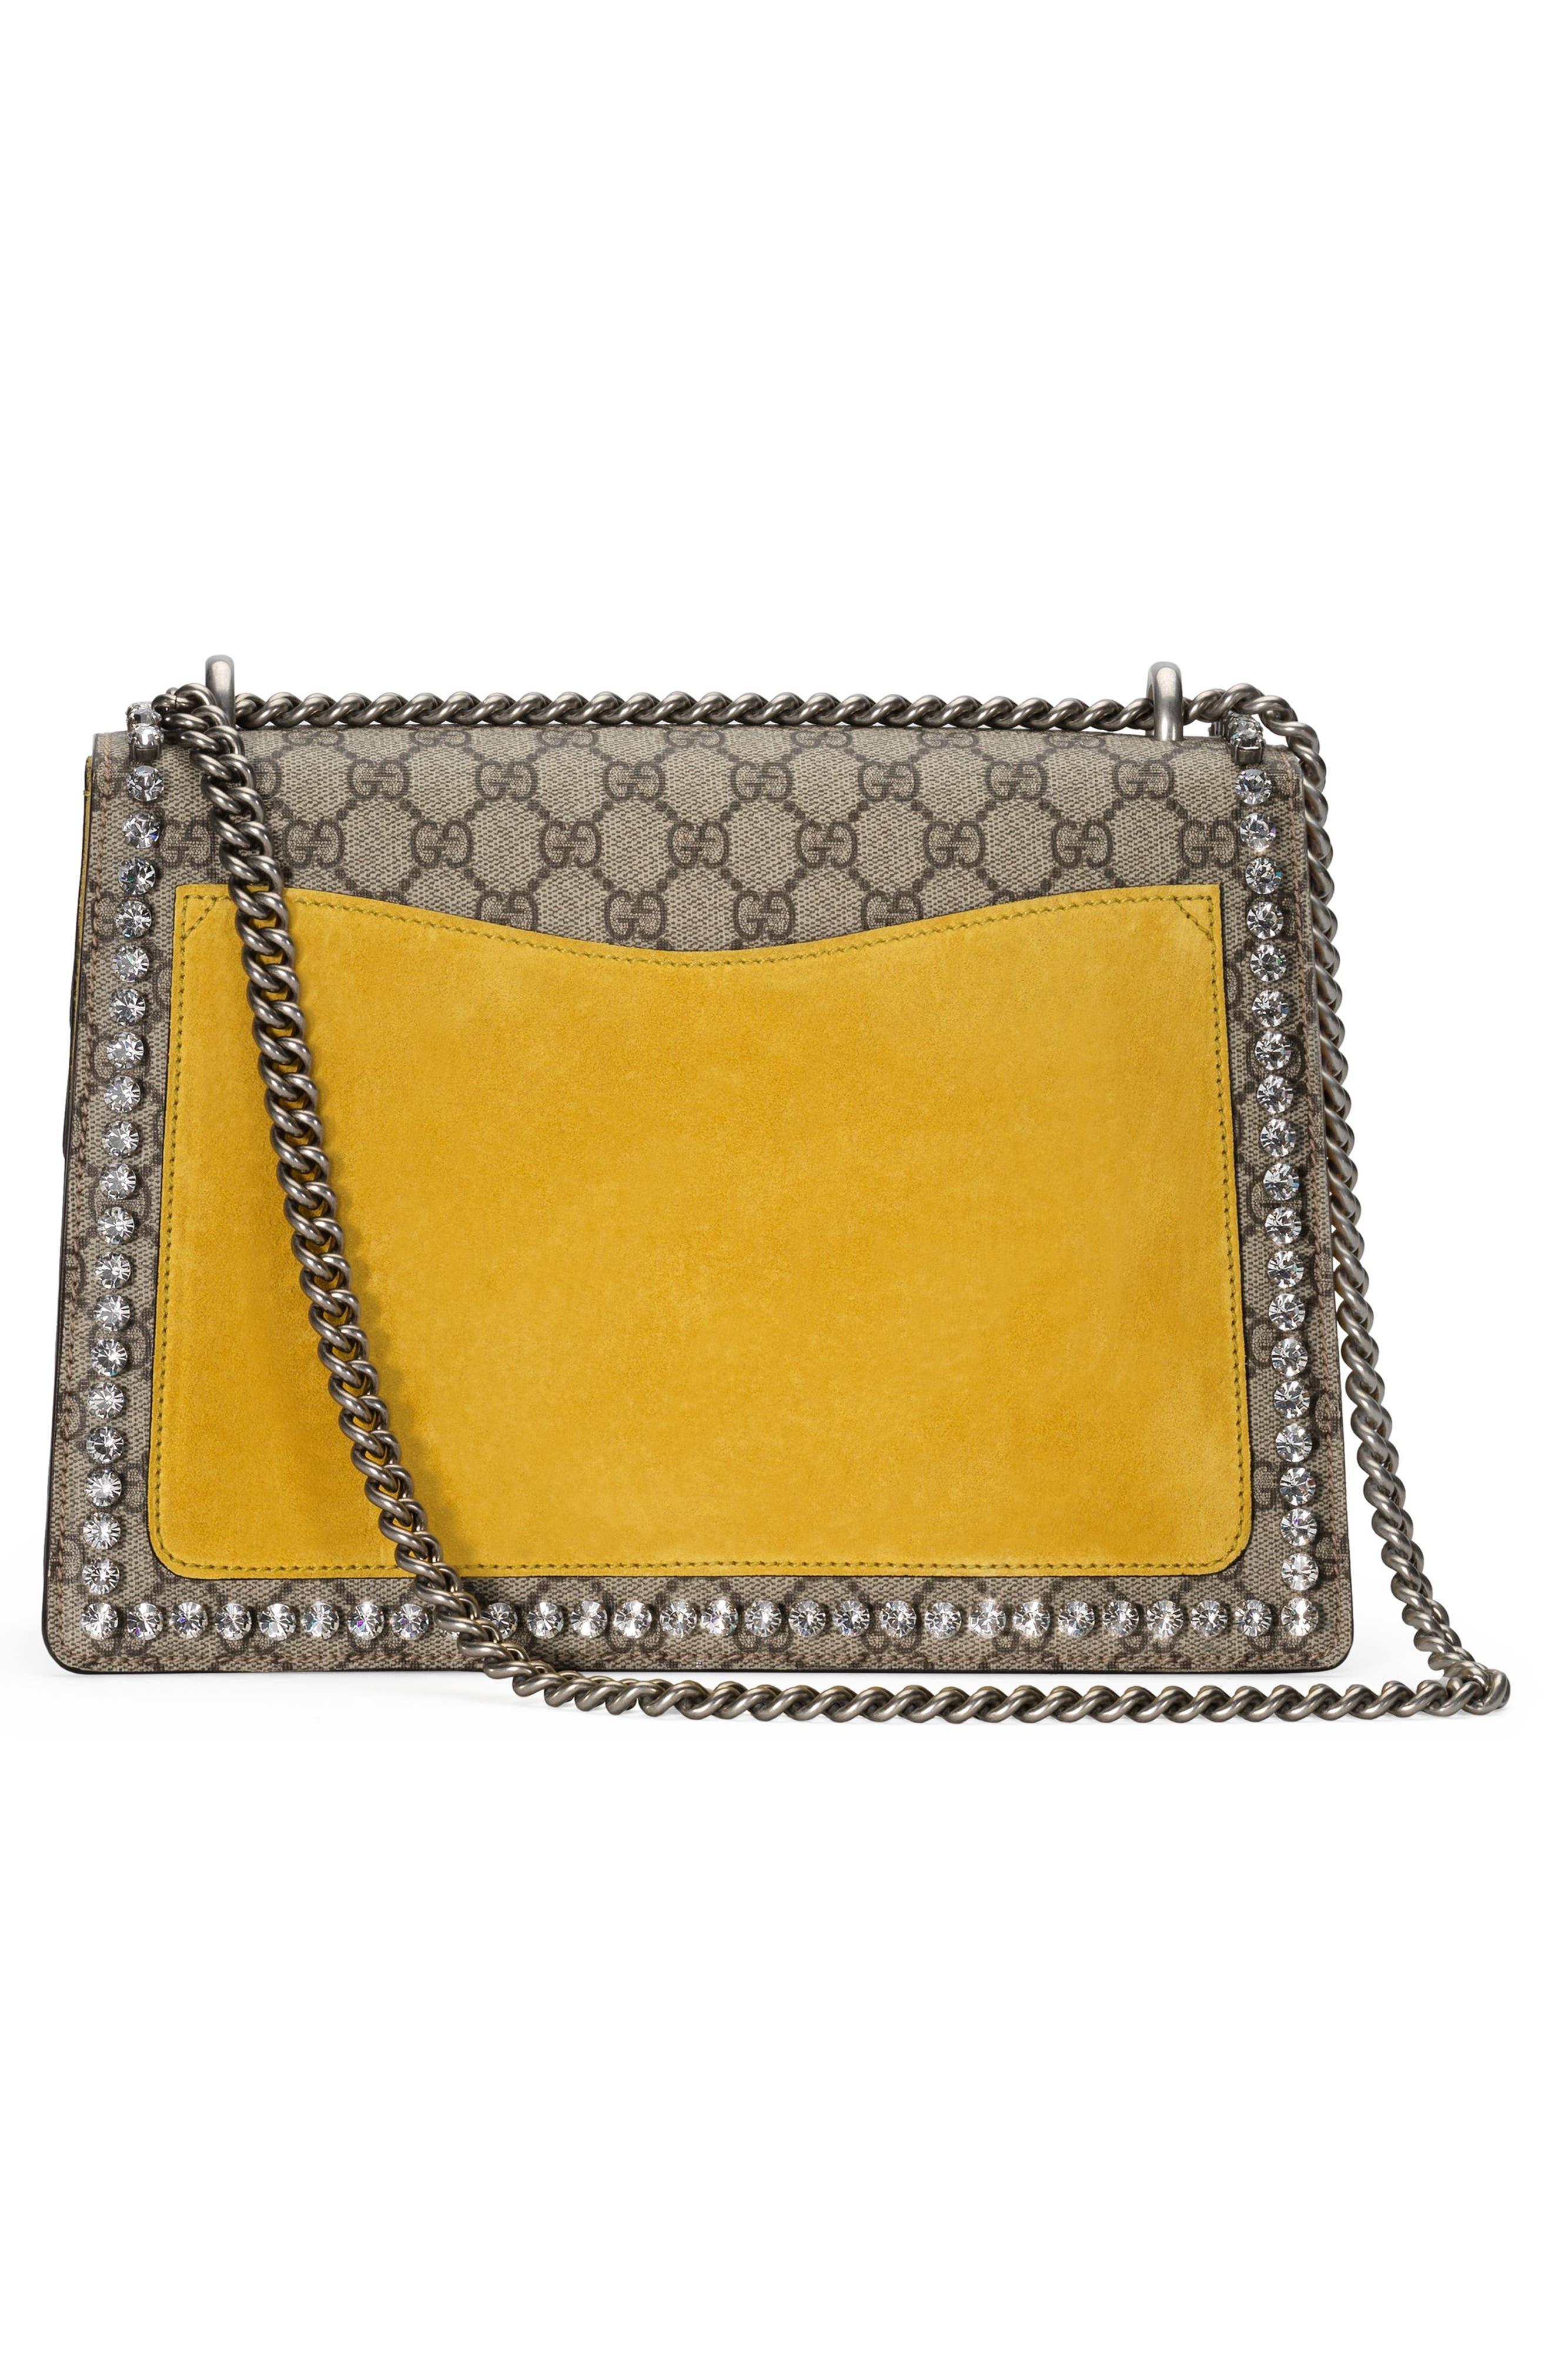 Medium Dionysus GG Supreme Canvas Shoulder Bag,                             Alternate thumbnail 2, color,                             250